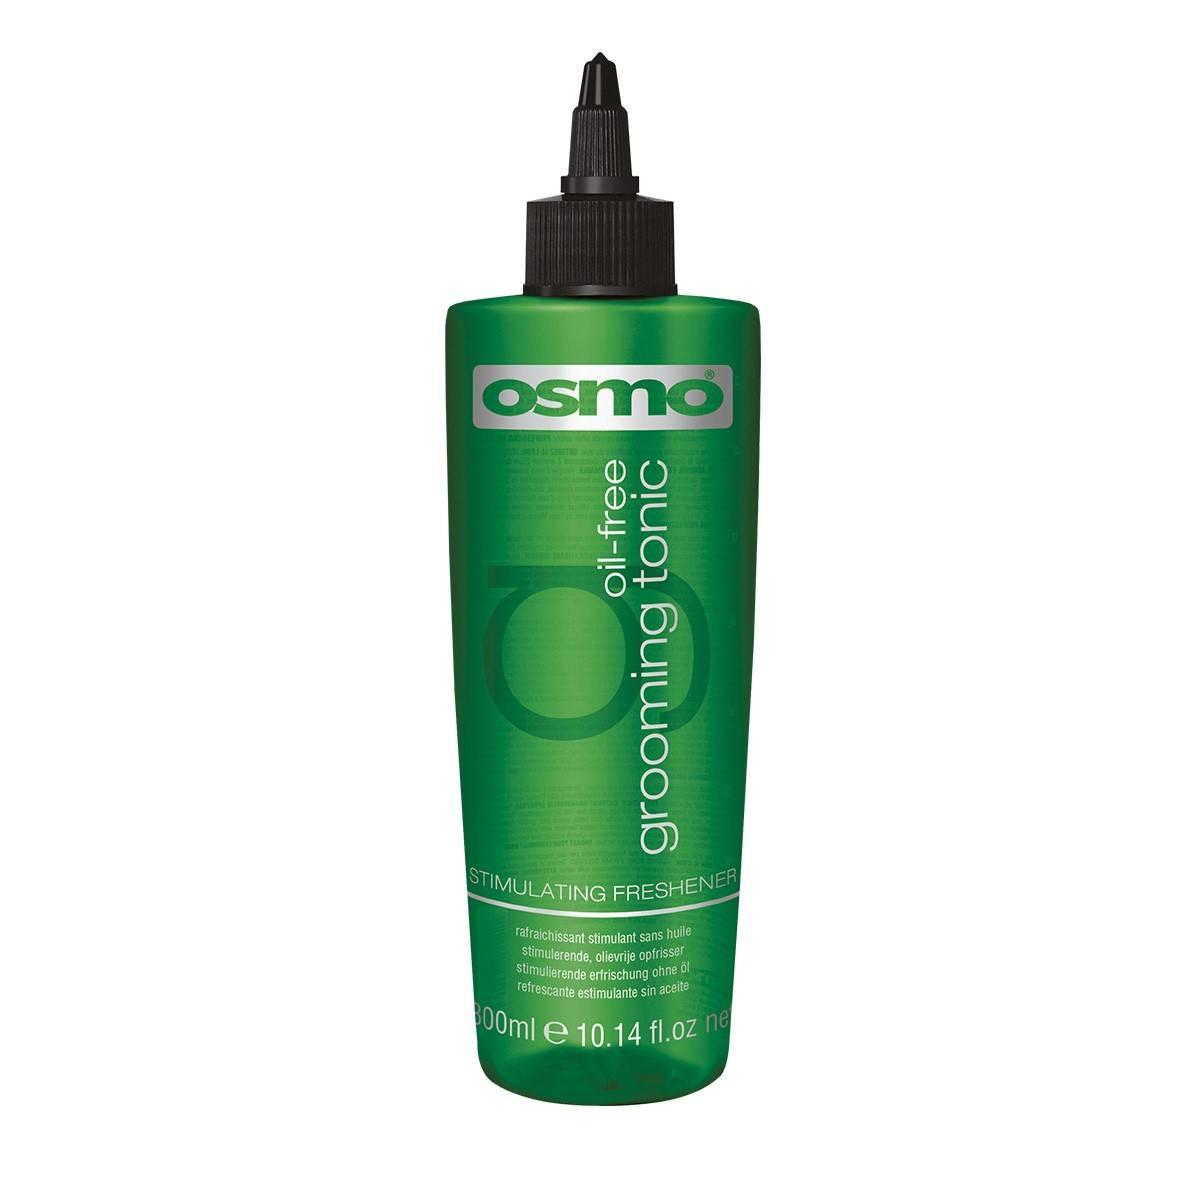 Grooming Tonic Oil Free Stimulating Freshener 300ml